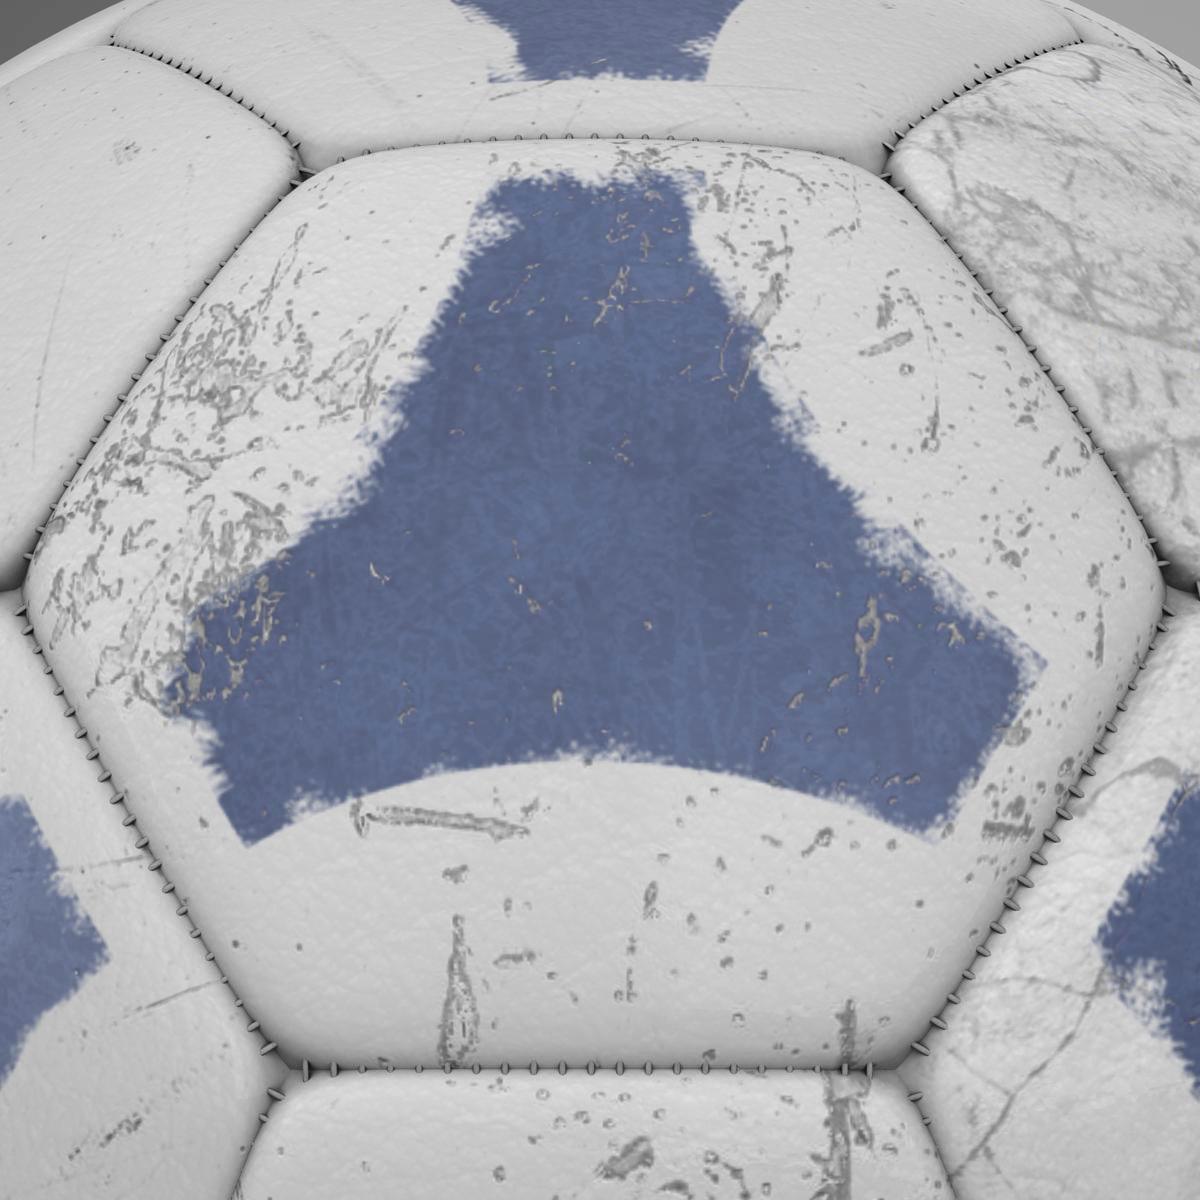 soccerball цэнхэр цагаан 3d загвар 3ds max fbx c4d ma mb obj 203989